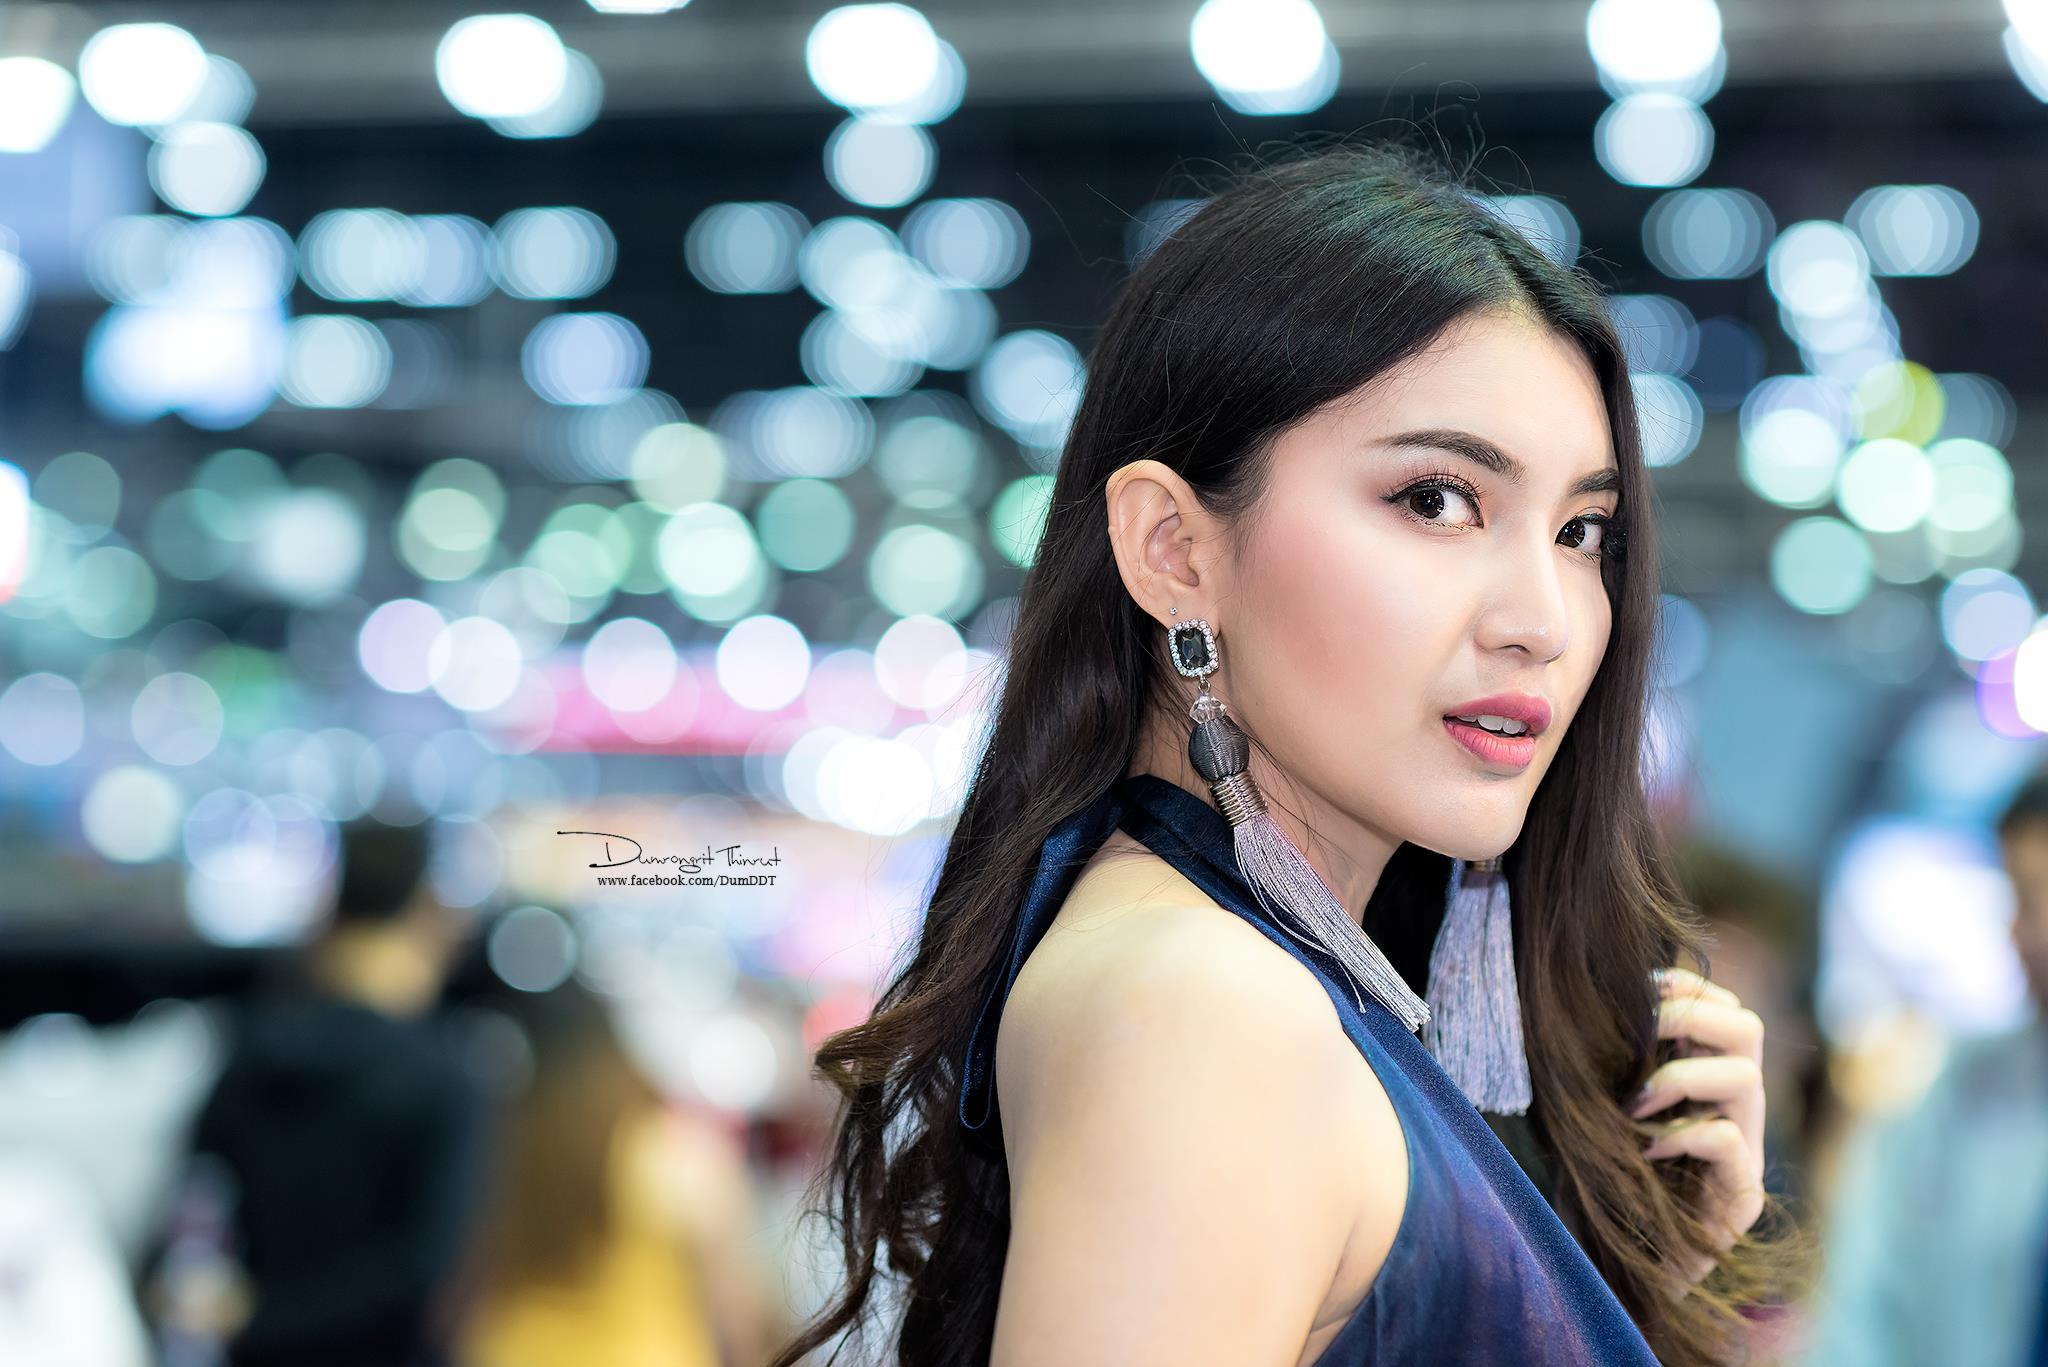 Thailand Motor Expo 2017 by Dumrongrit Dom Thinrut